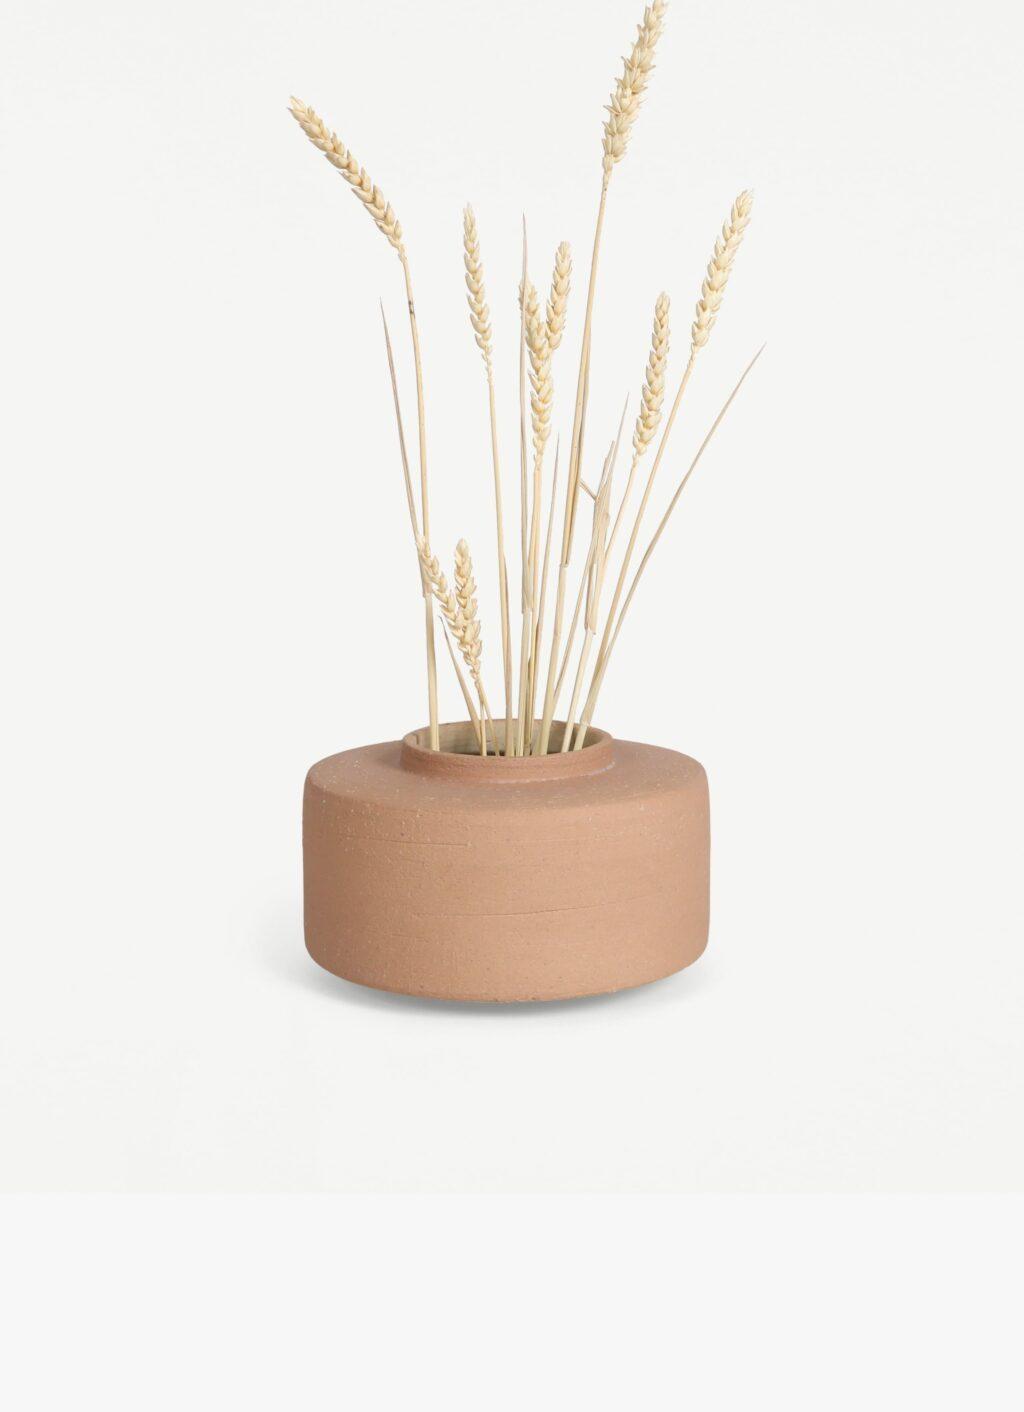 Frama - Otto - Platform Vase - Terra Sand - Small